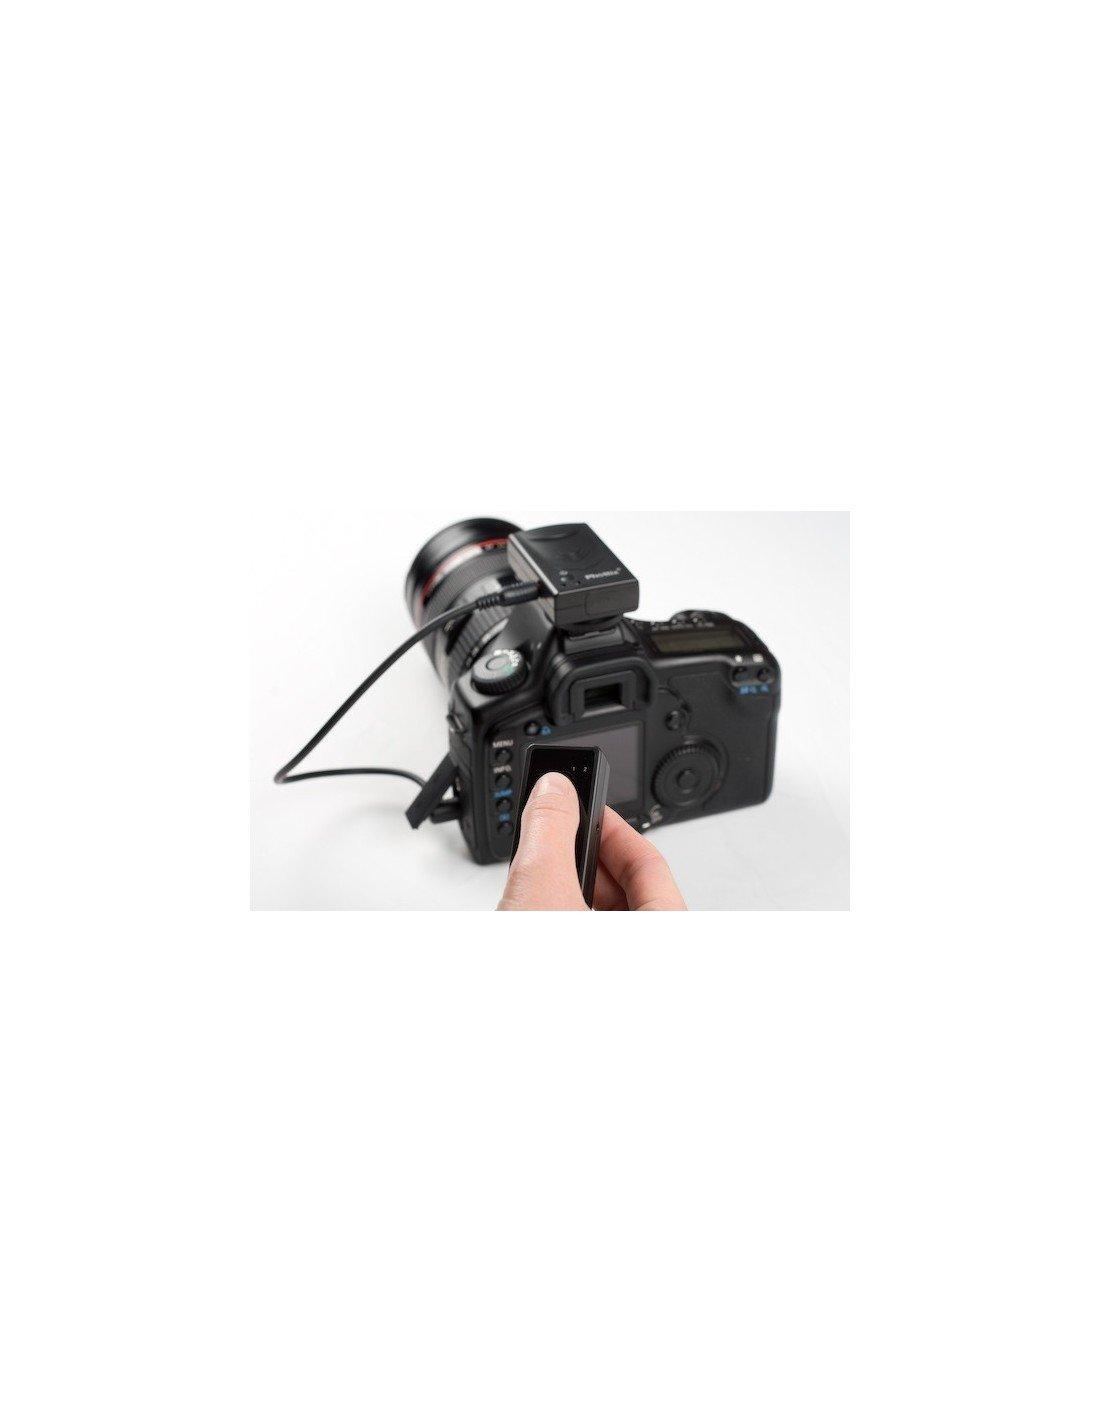 Objetivo Tamron Sp Af 70 300mm F 4 56 Di Vc Usd Para Nikon Y Uv 62mm For F4 Lens